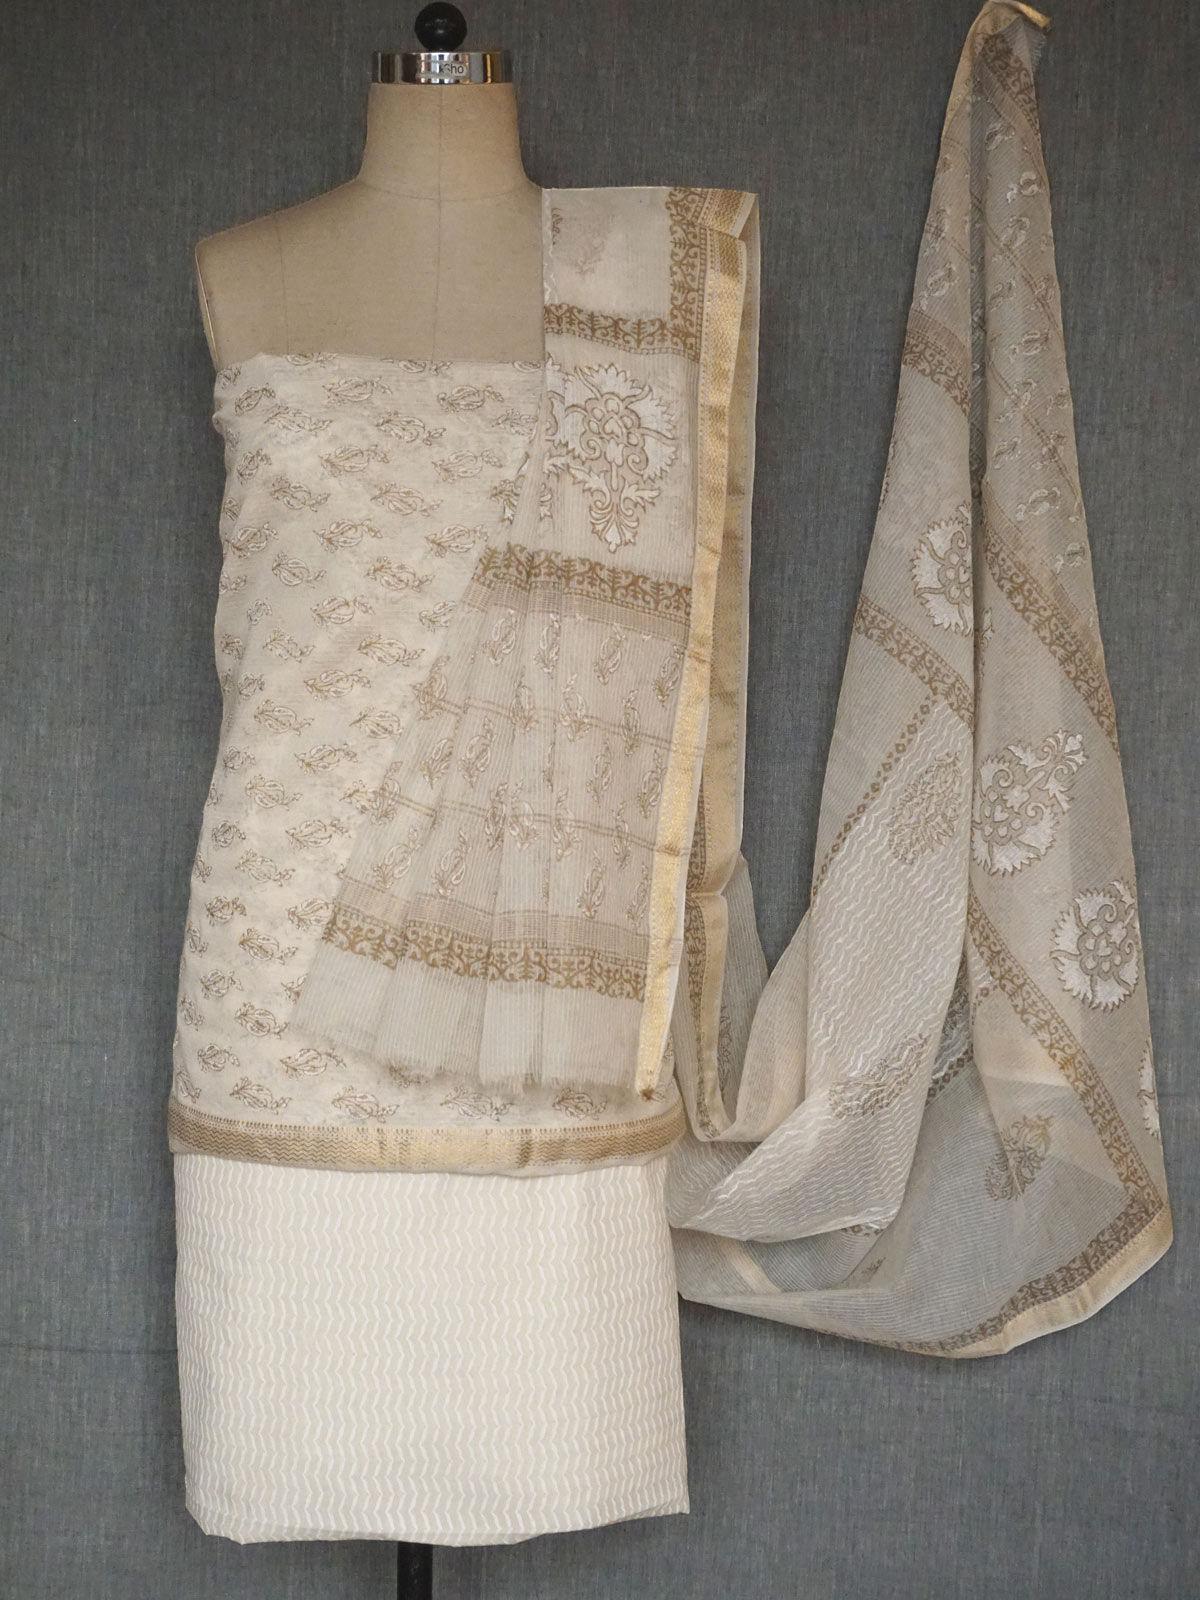 Off white maheshwari dress material with maheshwari dupatta